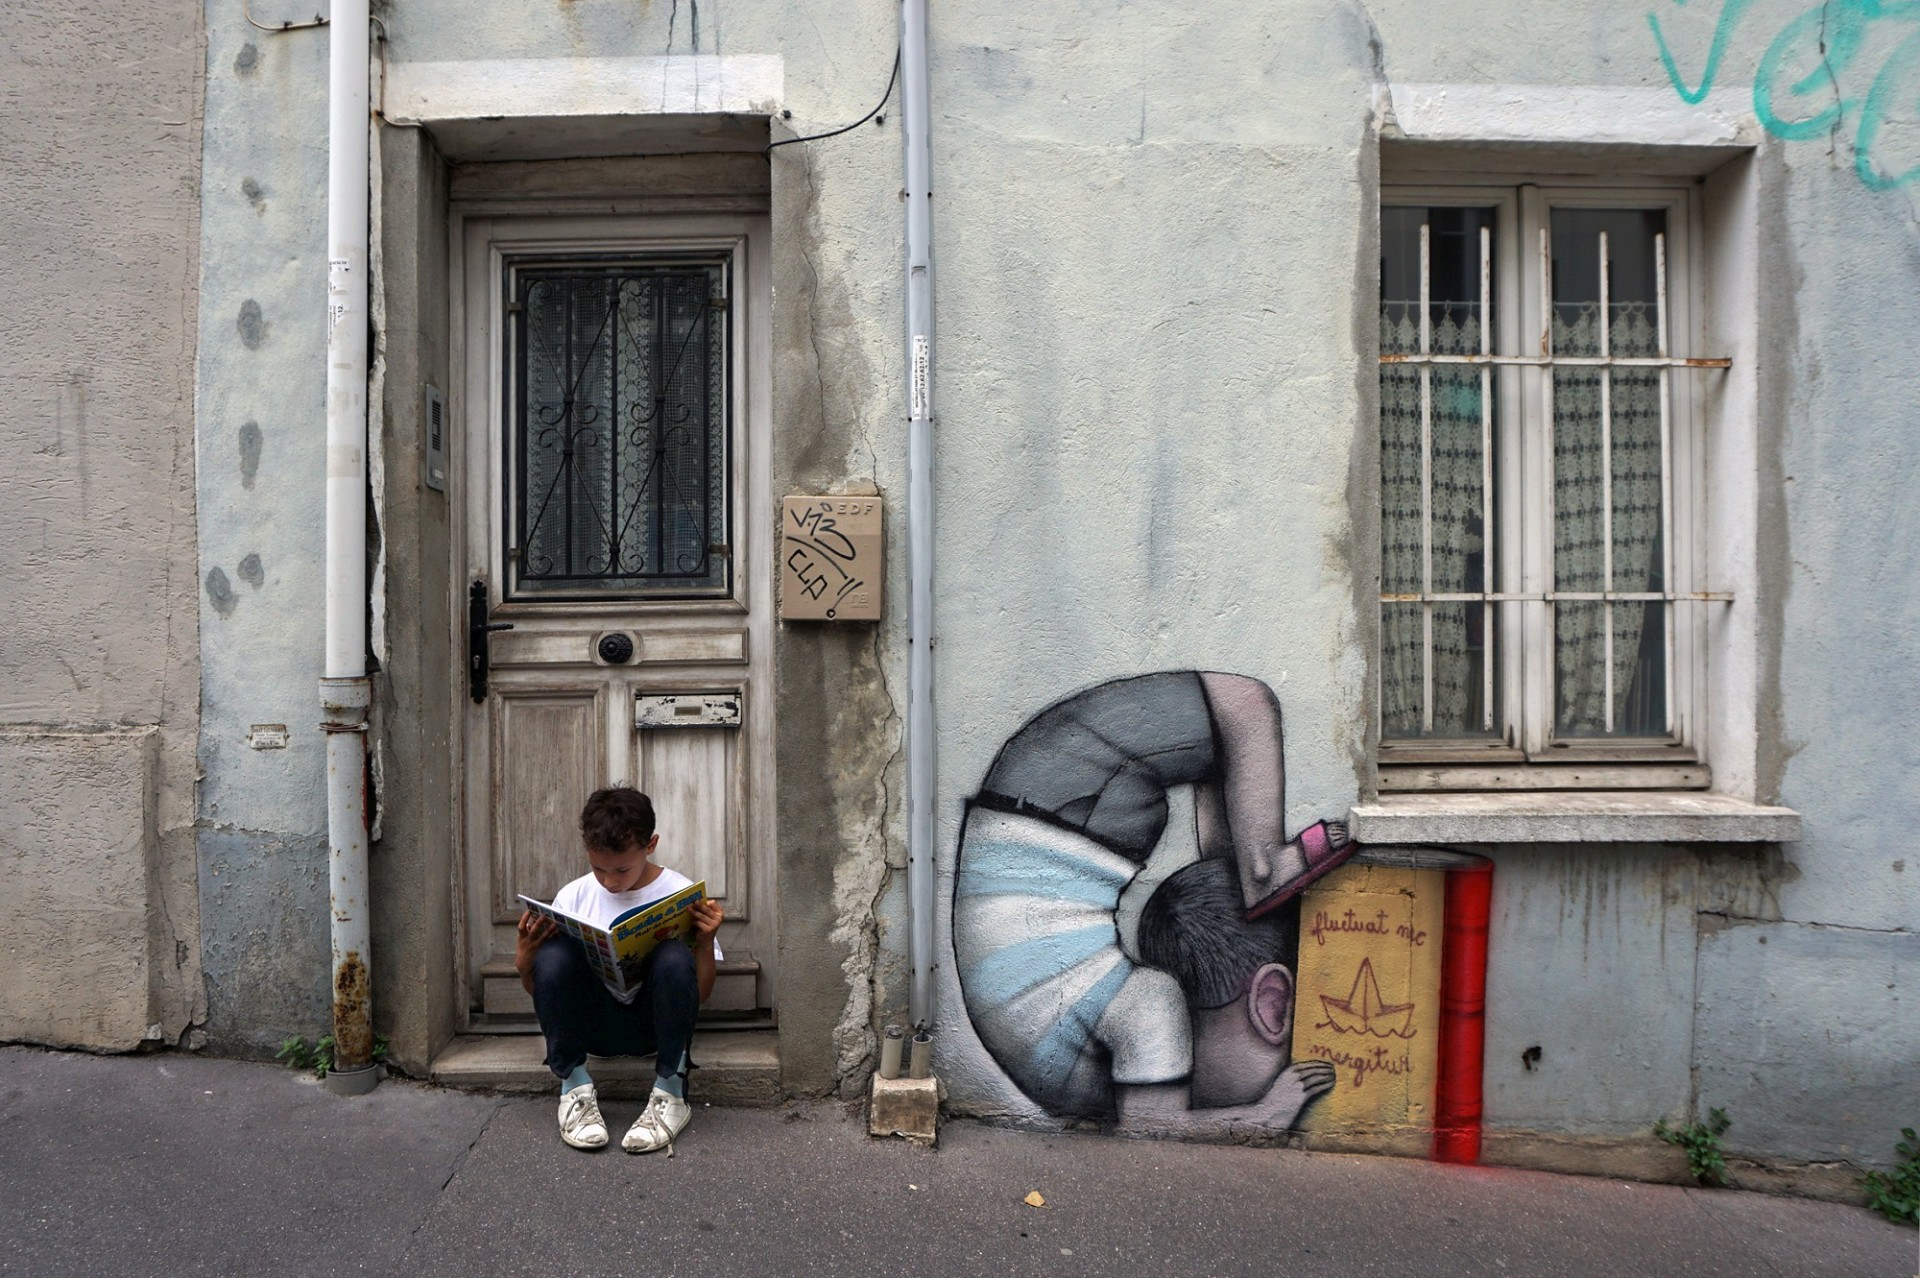 2018_paris-rue-buot-960x639@2x.jpg